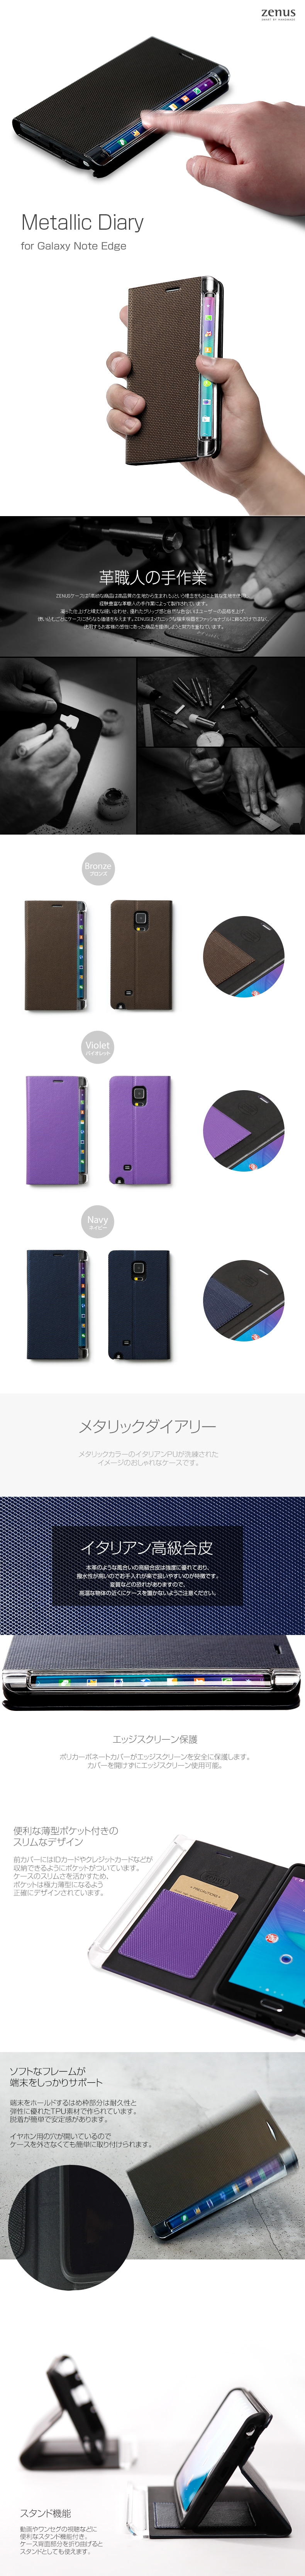 商品詳細-GALAXY Note Edge専用ケース